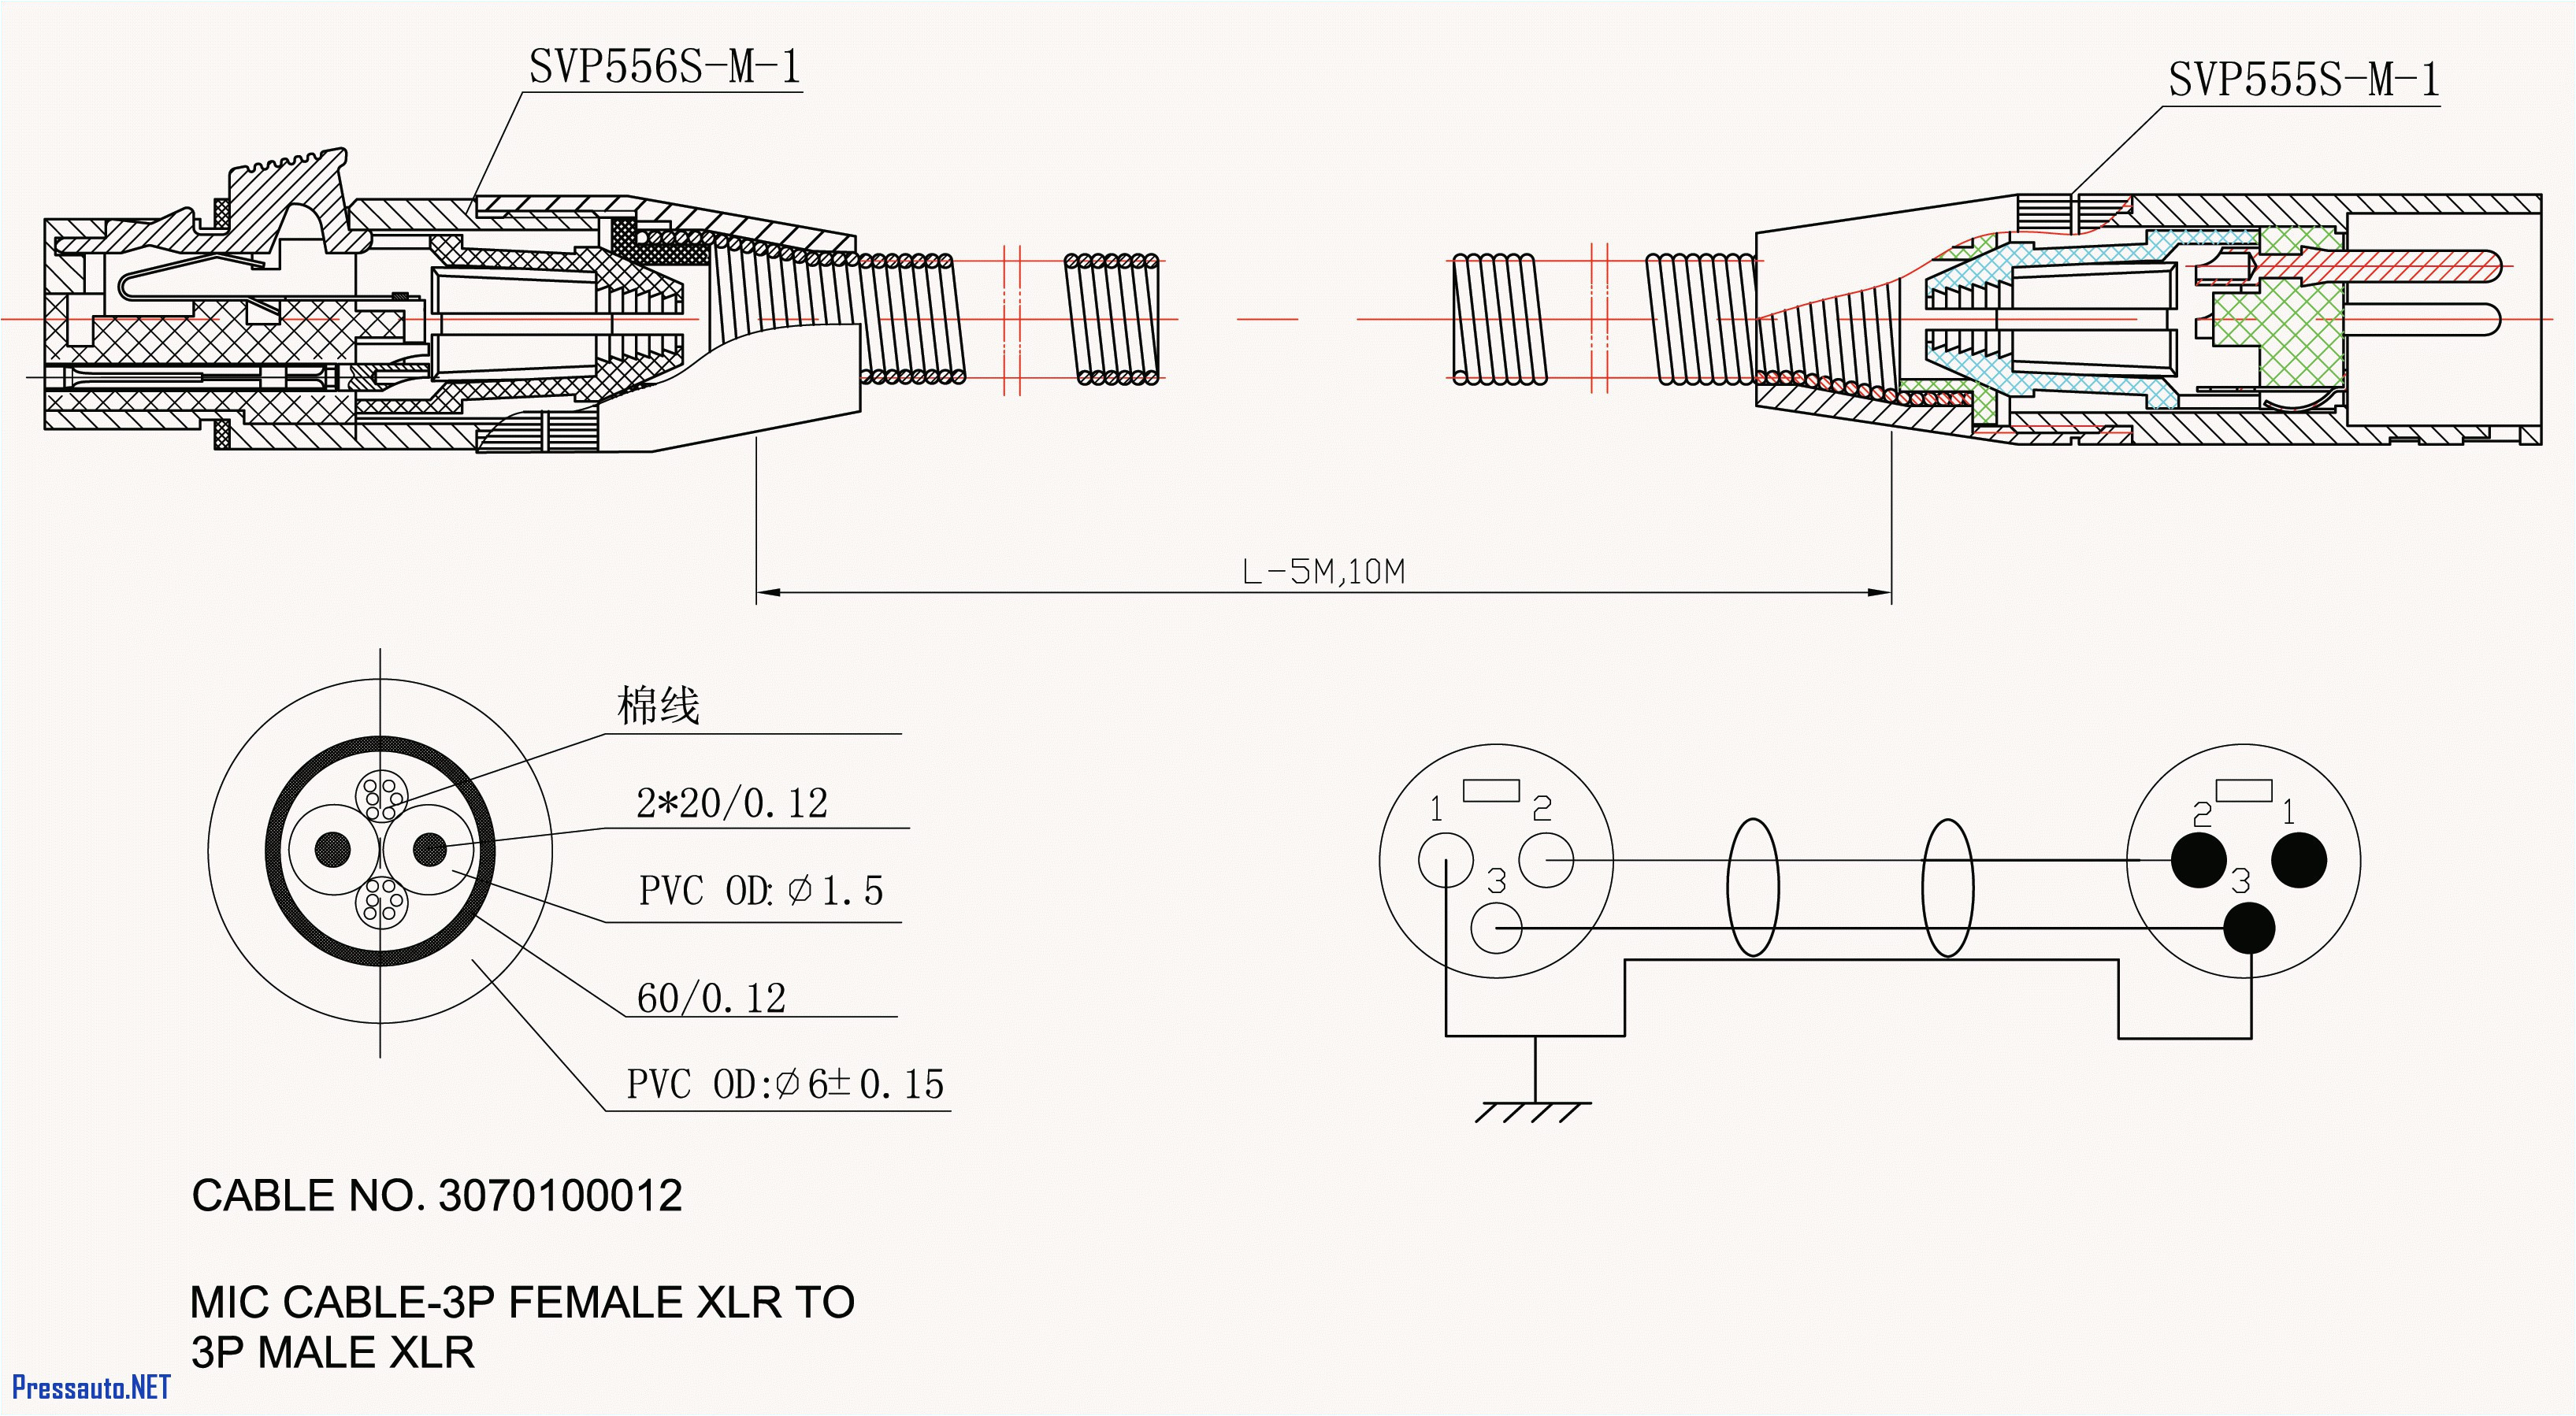 wiring diagram vs schematic beautiful denso alternator wiring diagram seilip mannheim